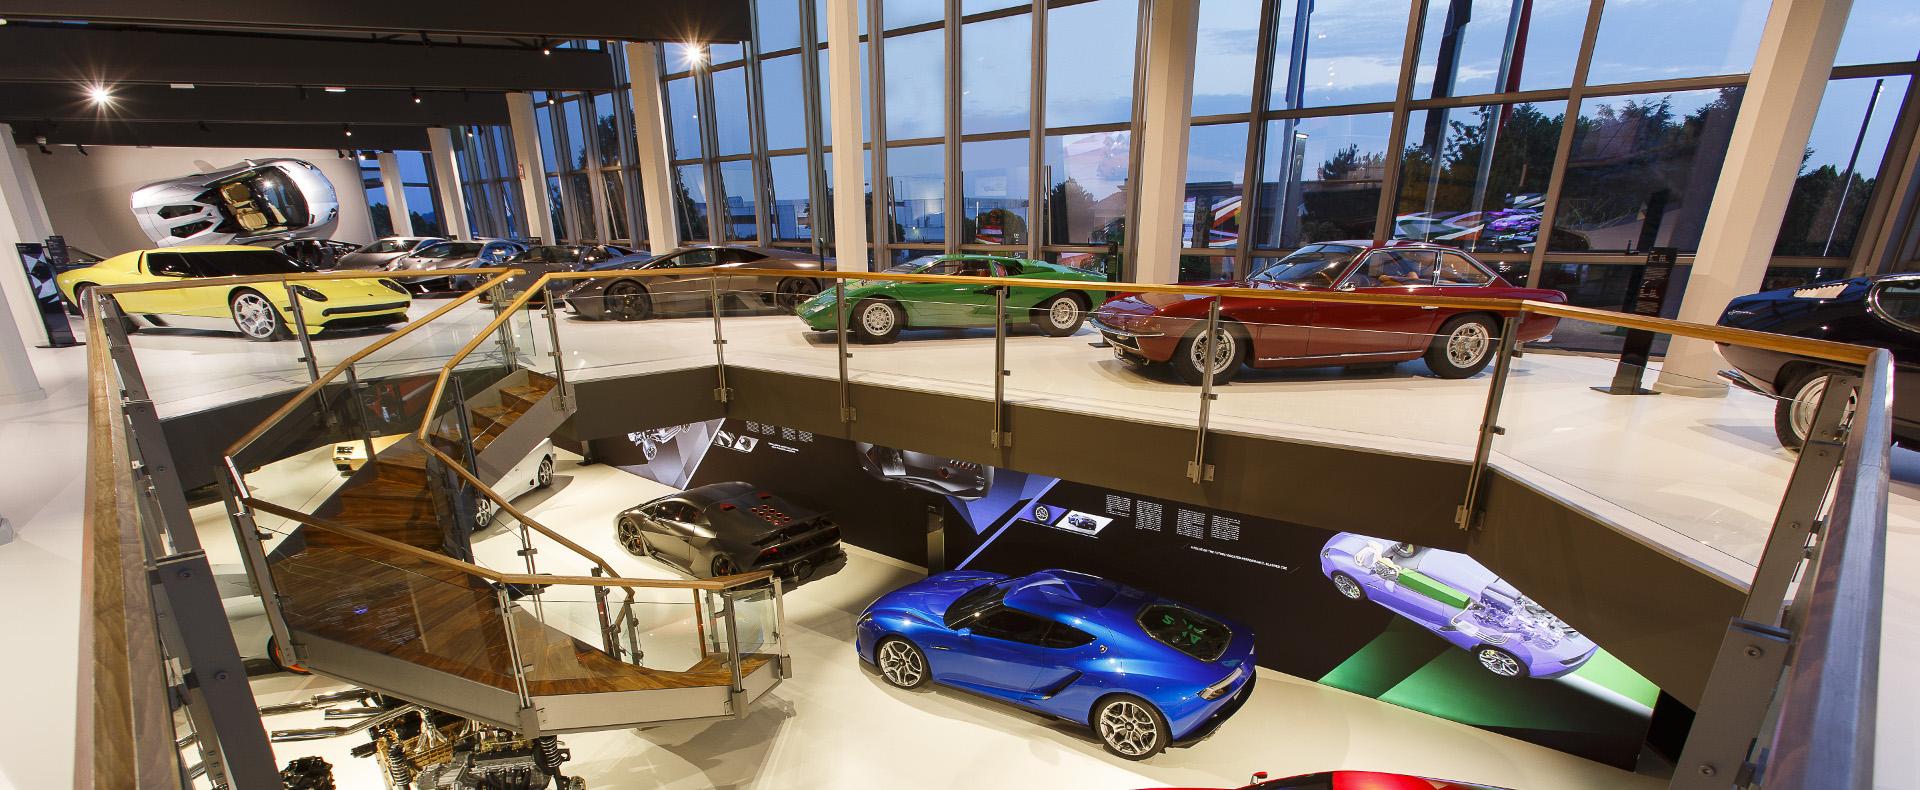 Visita guidata al Museo Lamborghini